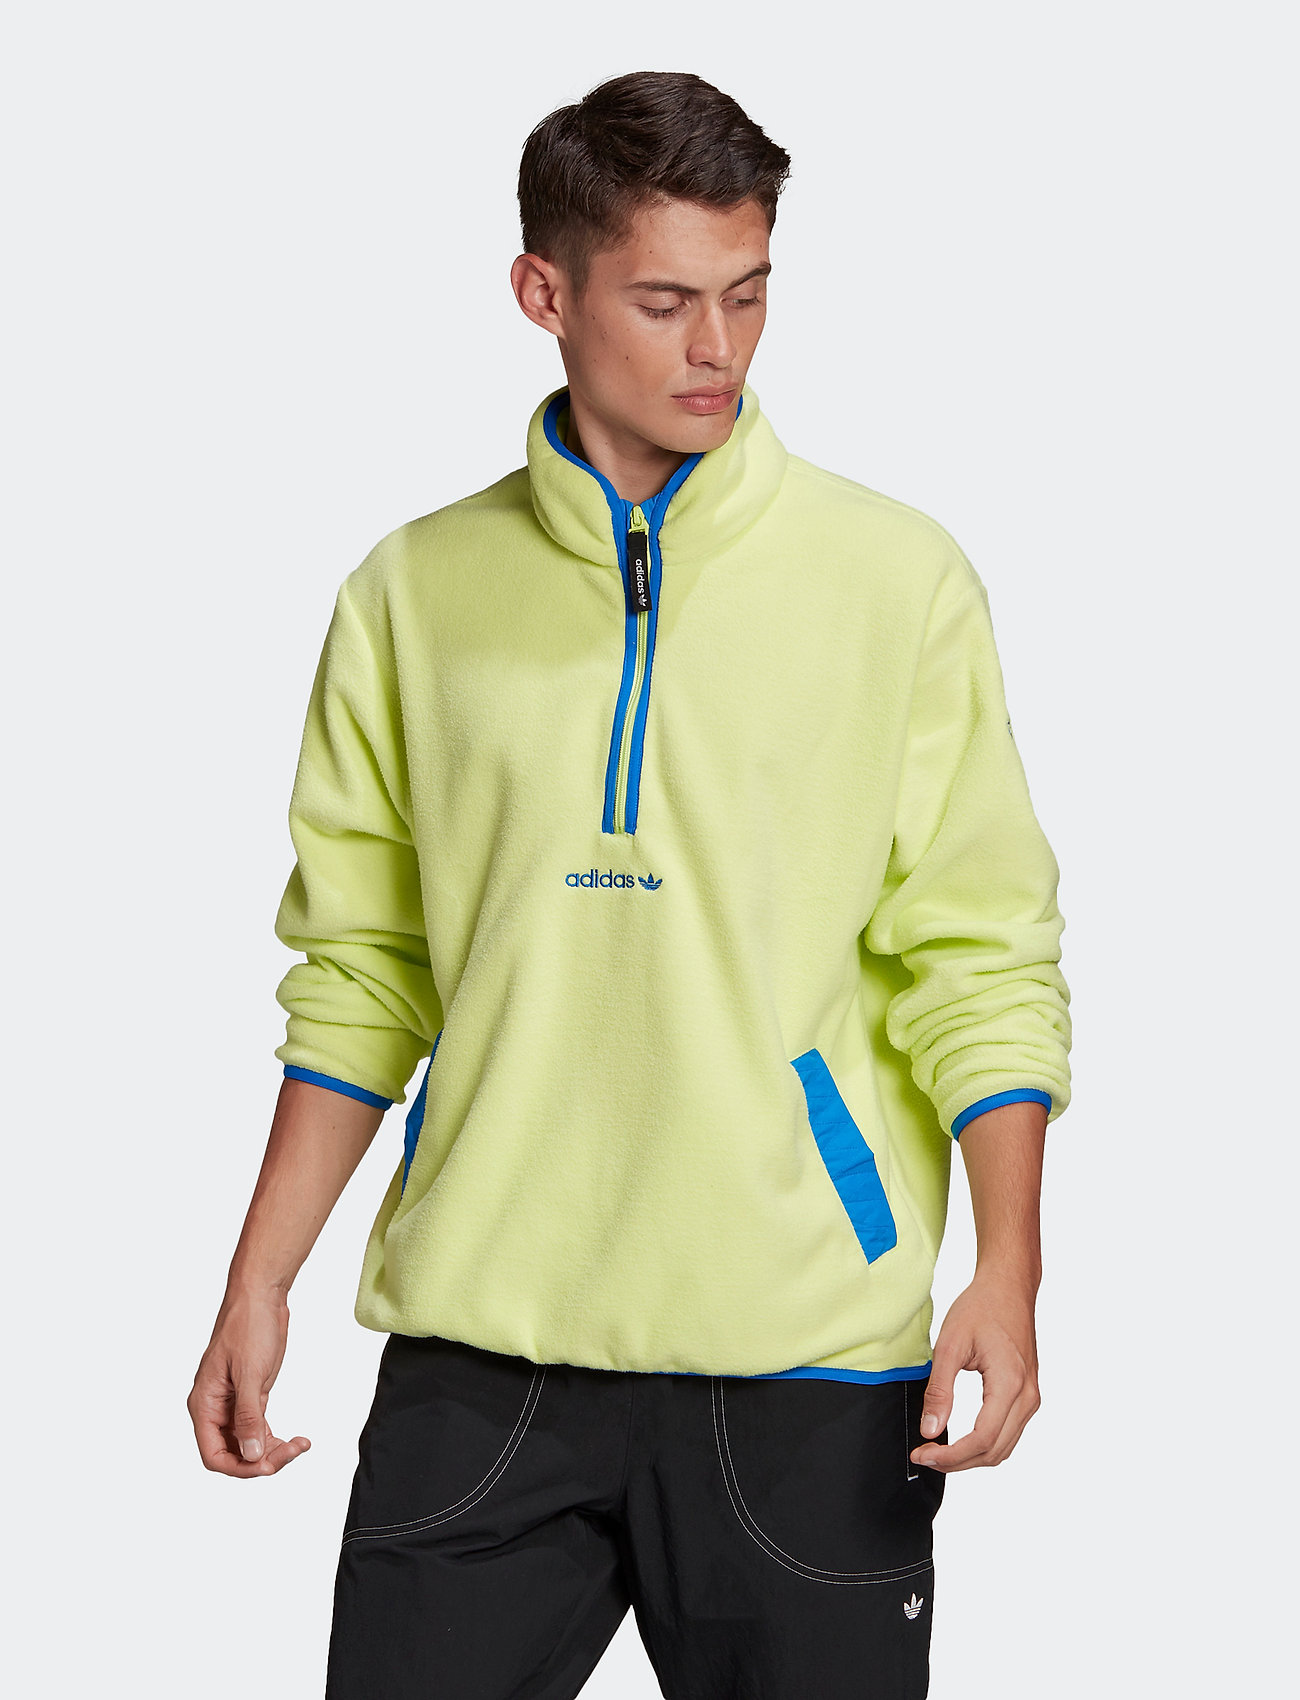 adidas Originals - Adventure Polar Fleece Half-Zip Sweatshirt - podstawowe bluzy - sefrye - 0